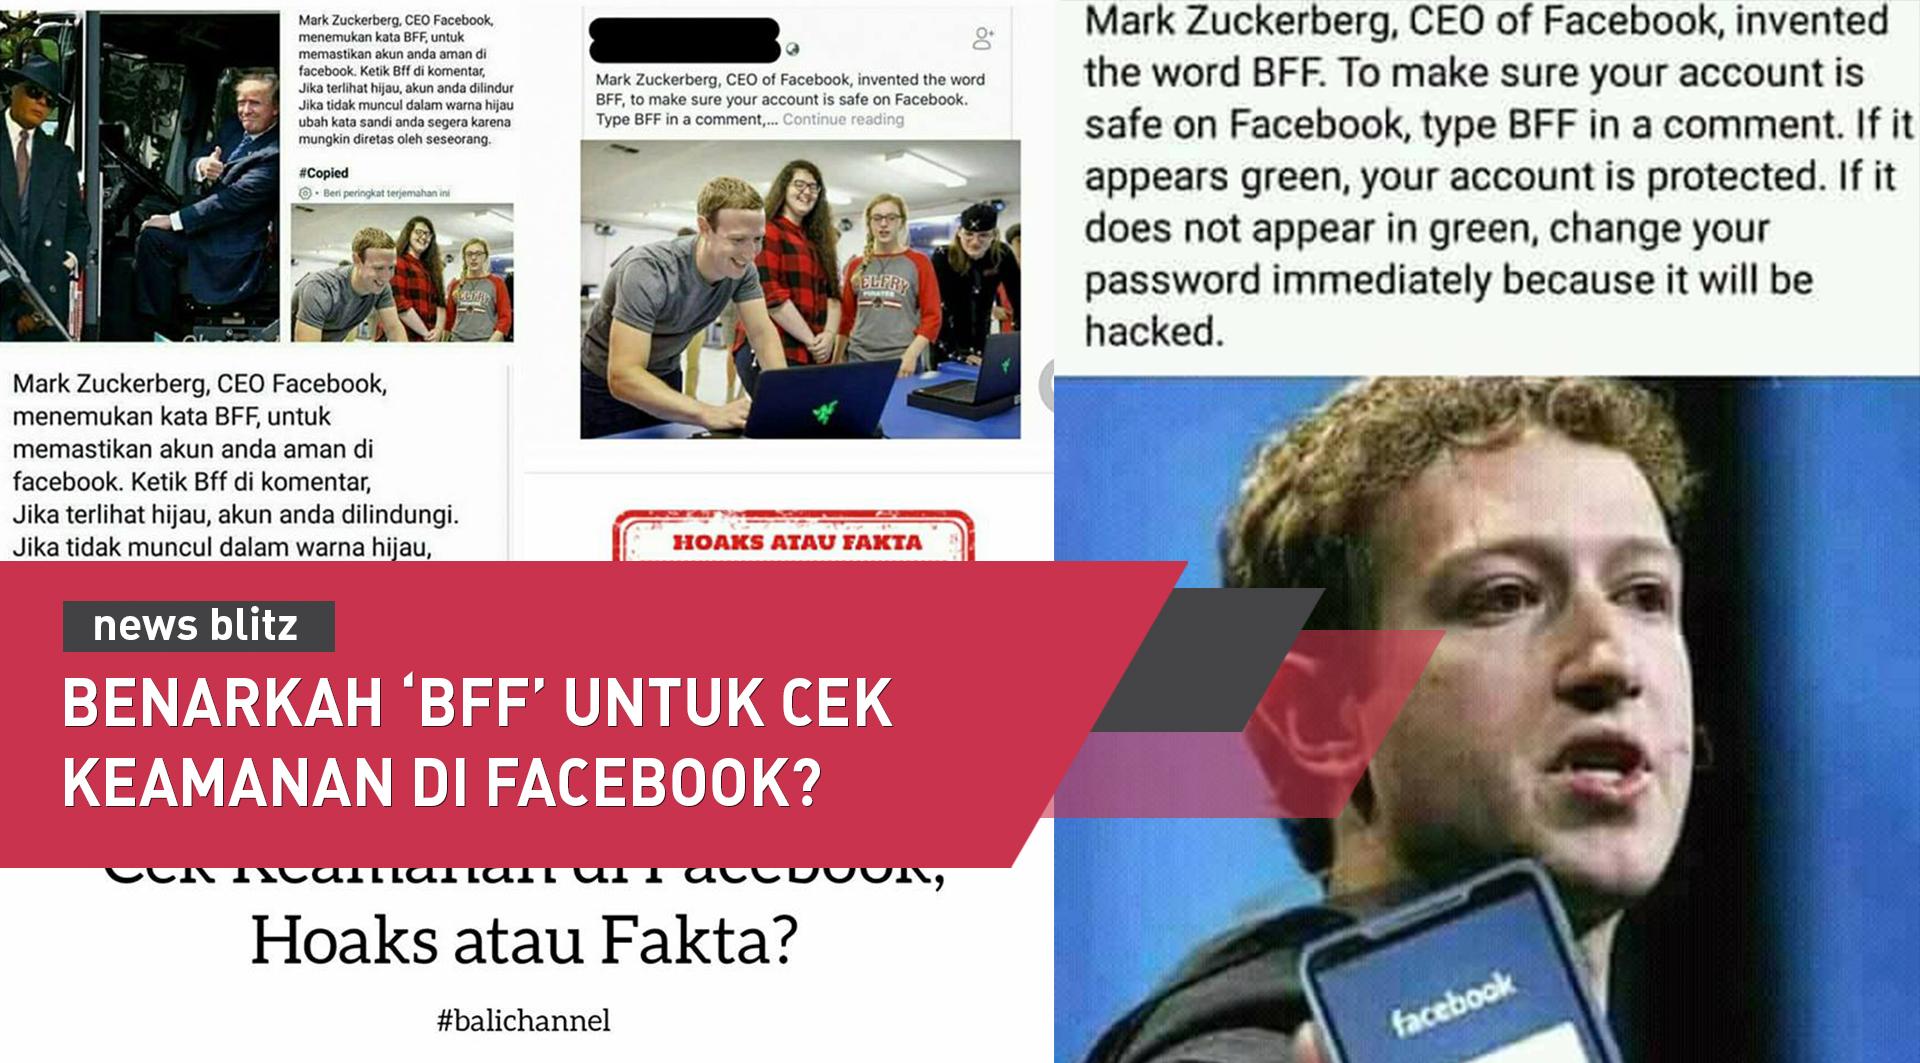 Benarkah 'BFF' untuk mengecek keamanan di Facebook?